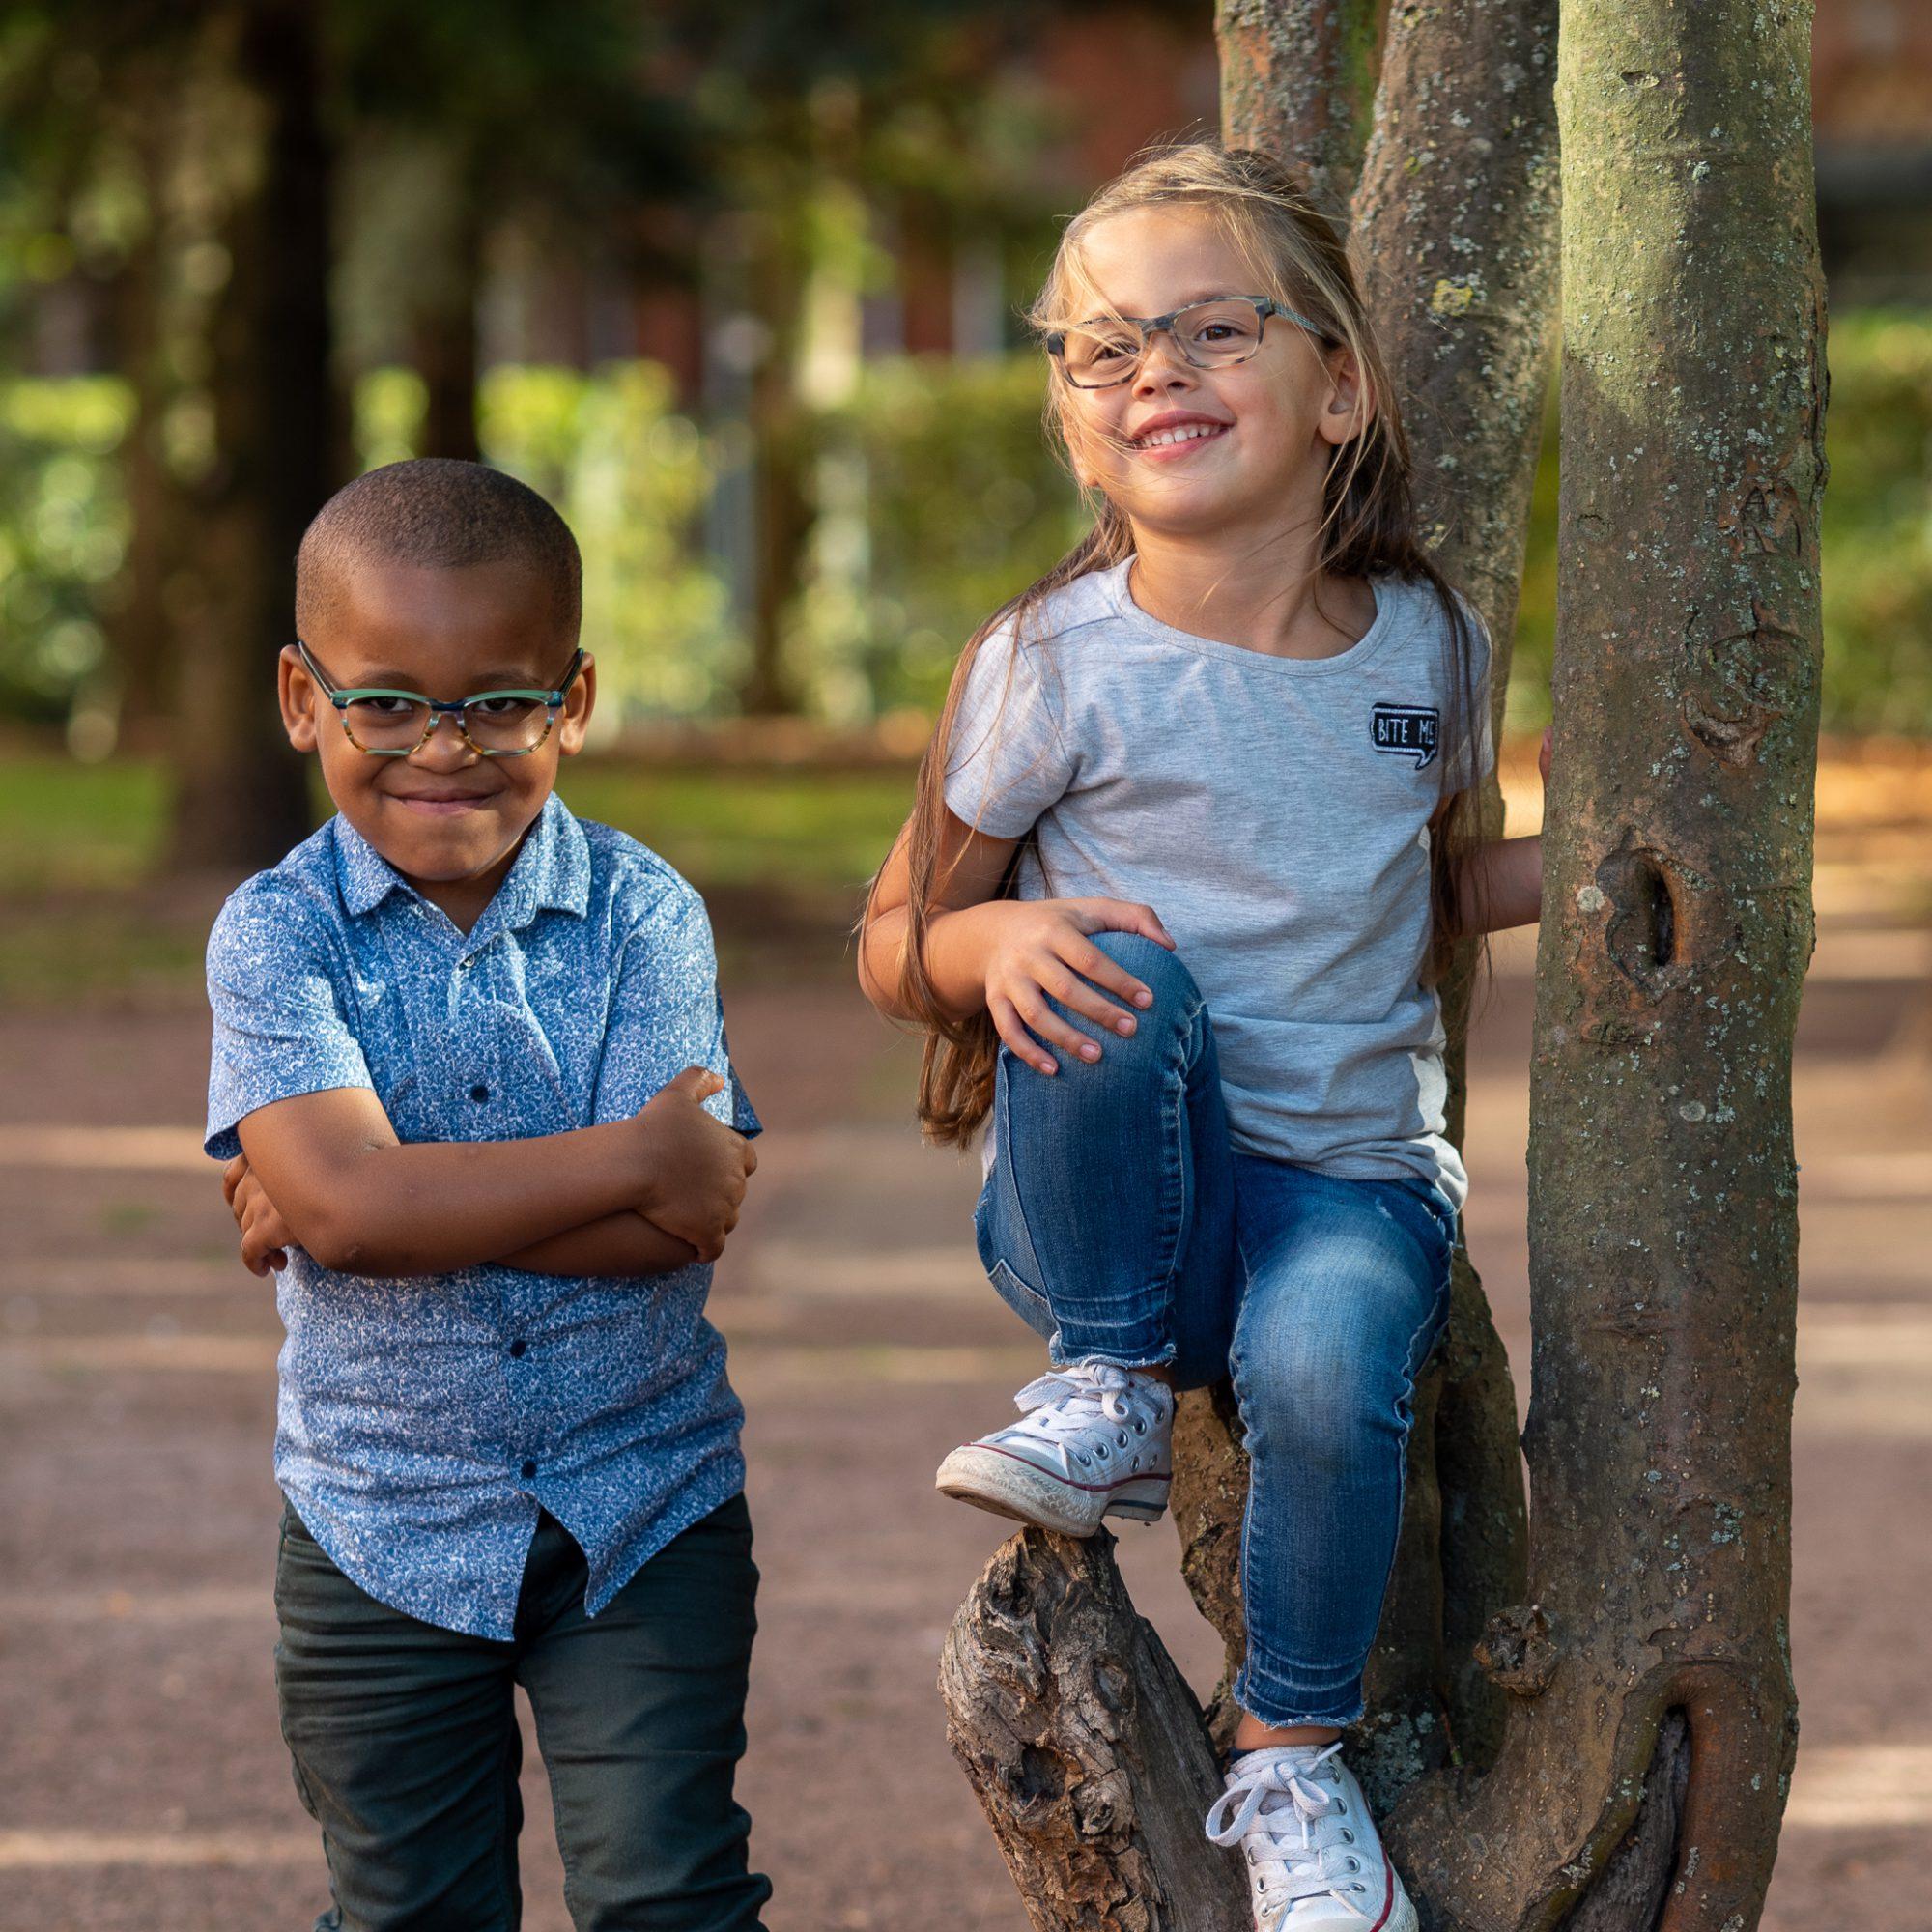 Kinderen Interpolis park Tilburg